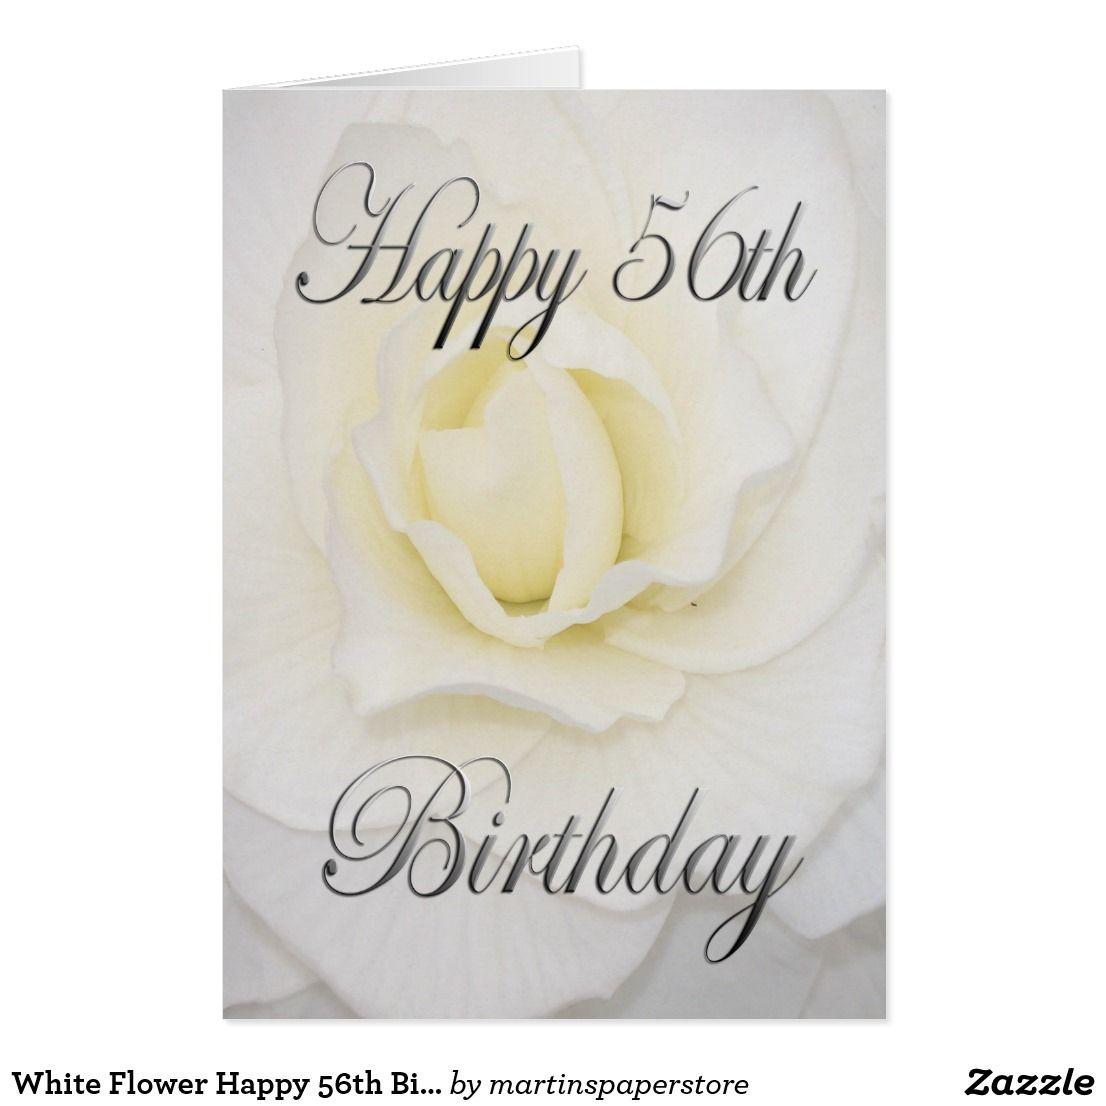 White Flower Happy 56th Birthday Card